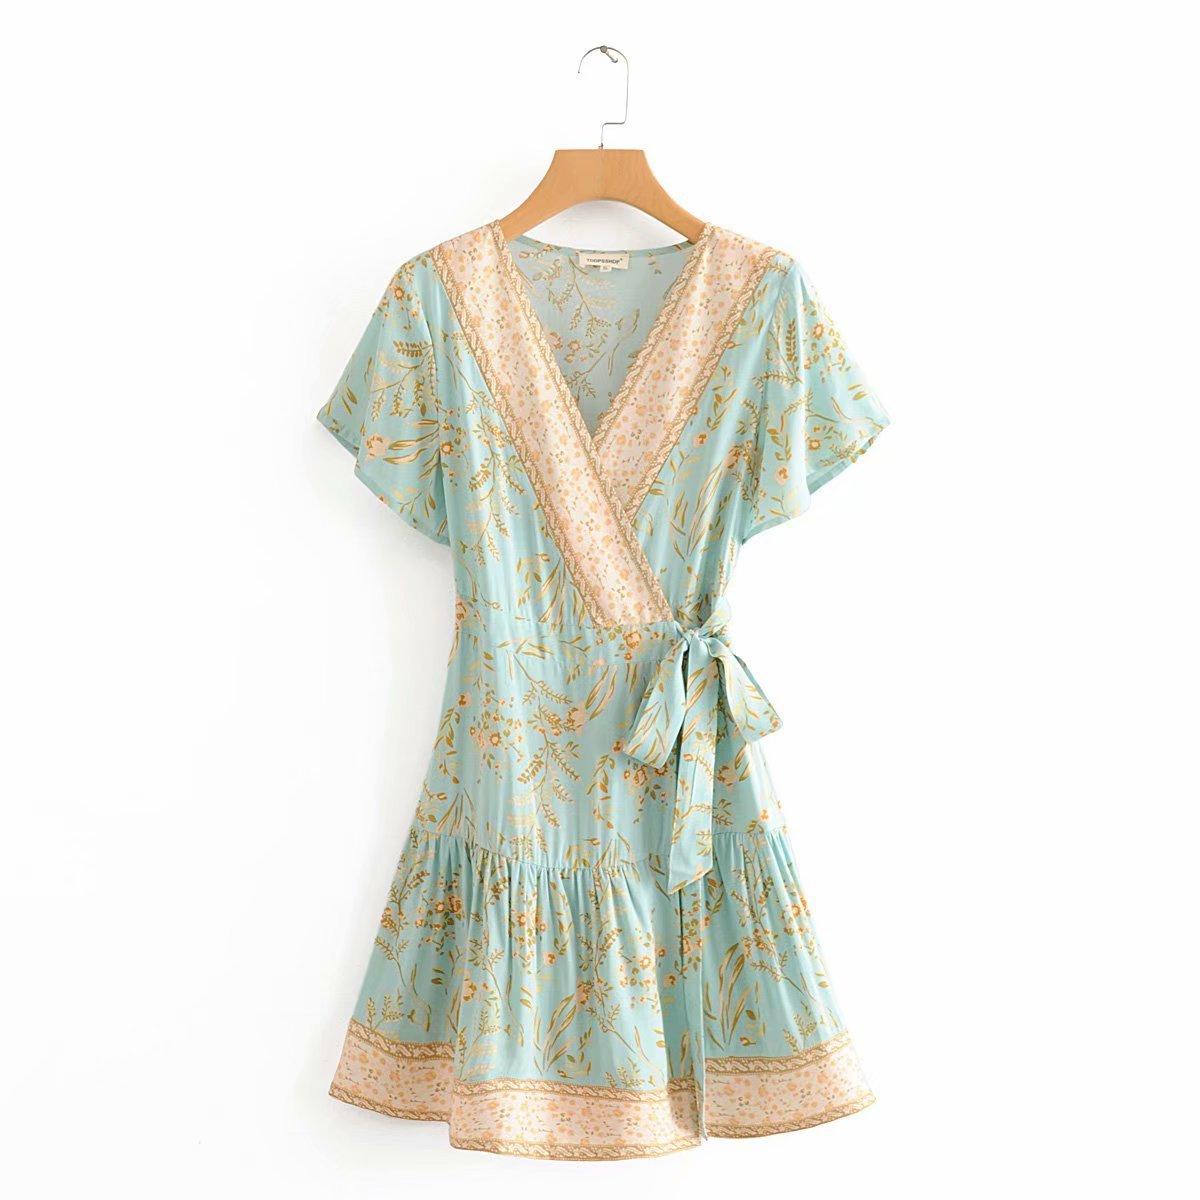 2020 New Spring Summer European Rice Positioning Printed Wrap Zaraing Women Dress Vadiming Sheining Female Dress DFJ9080